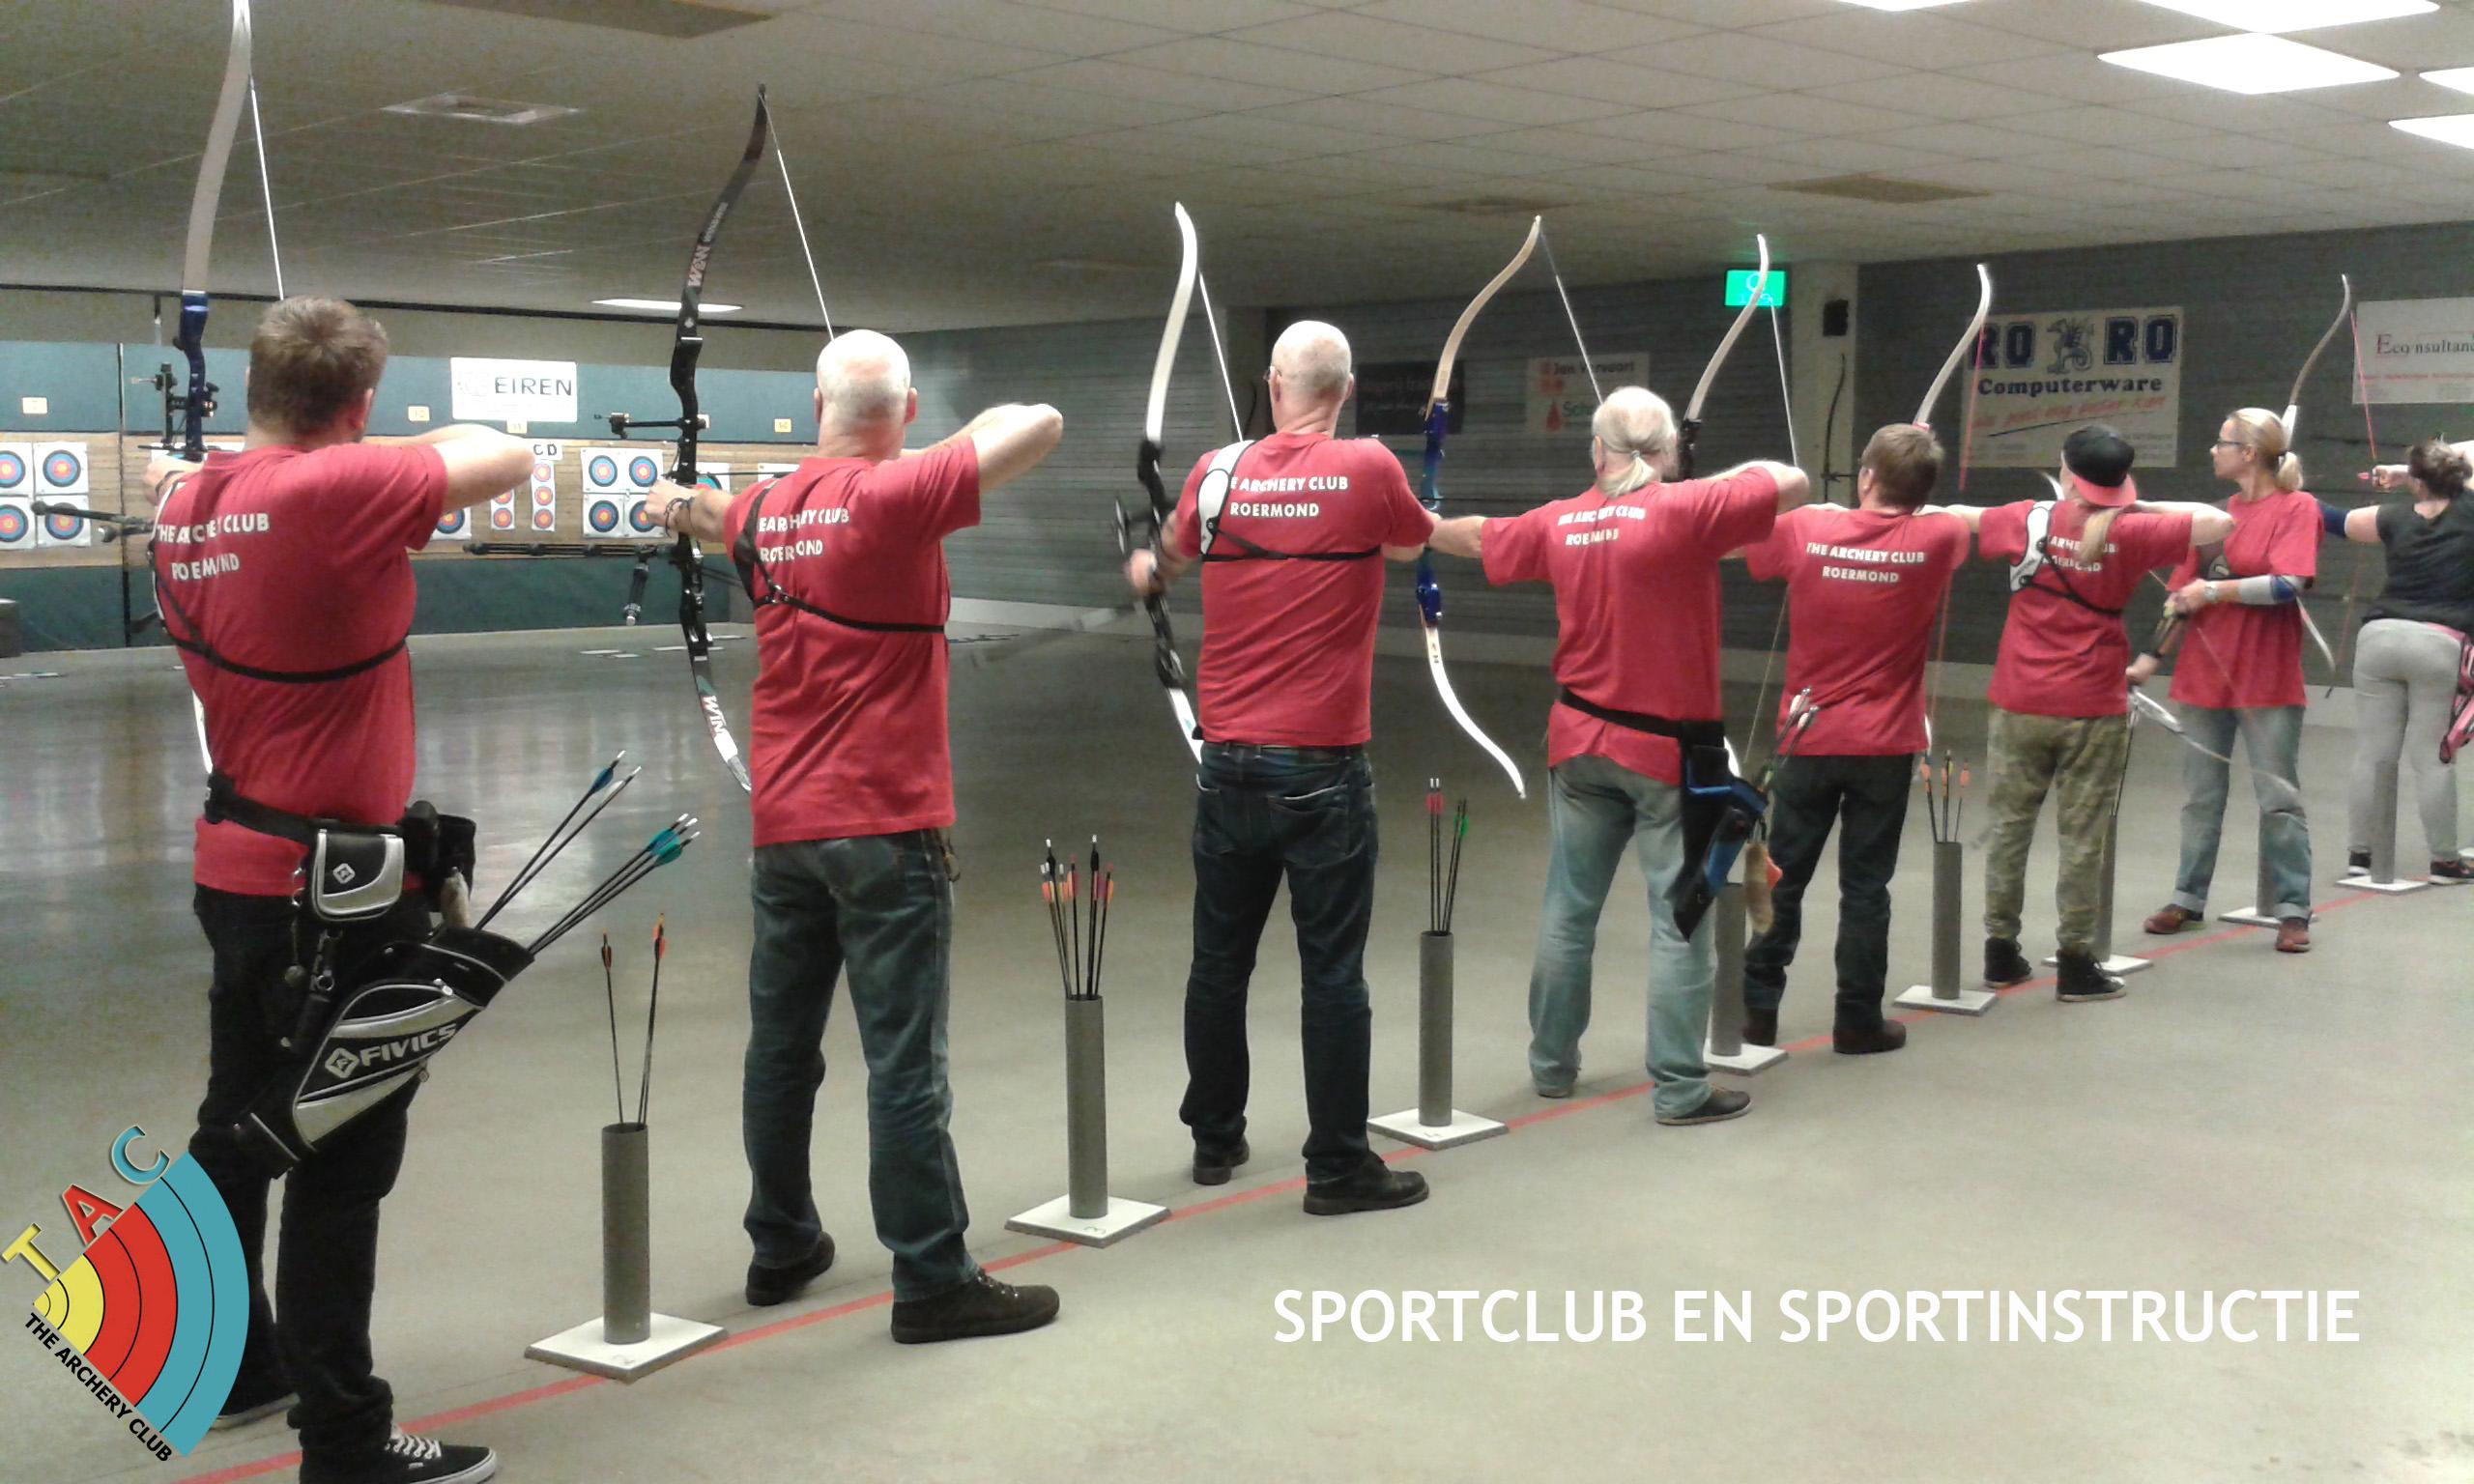 The Archery Club